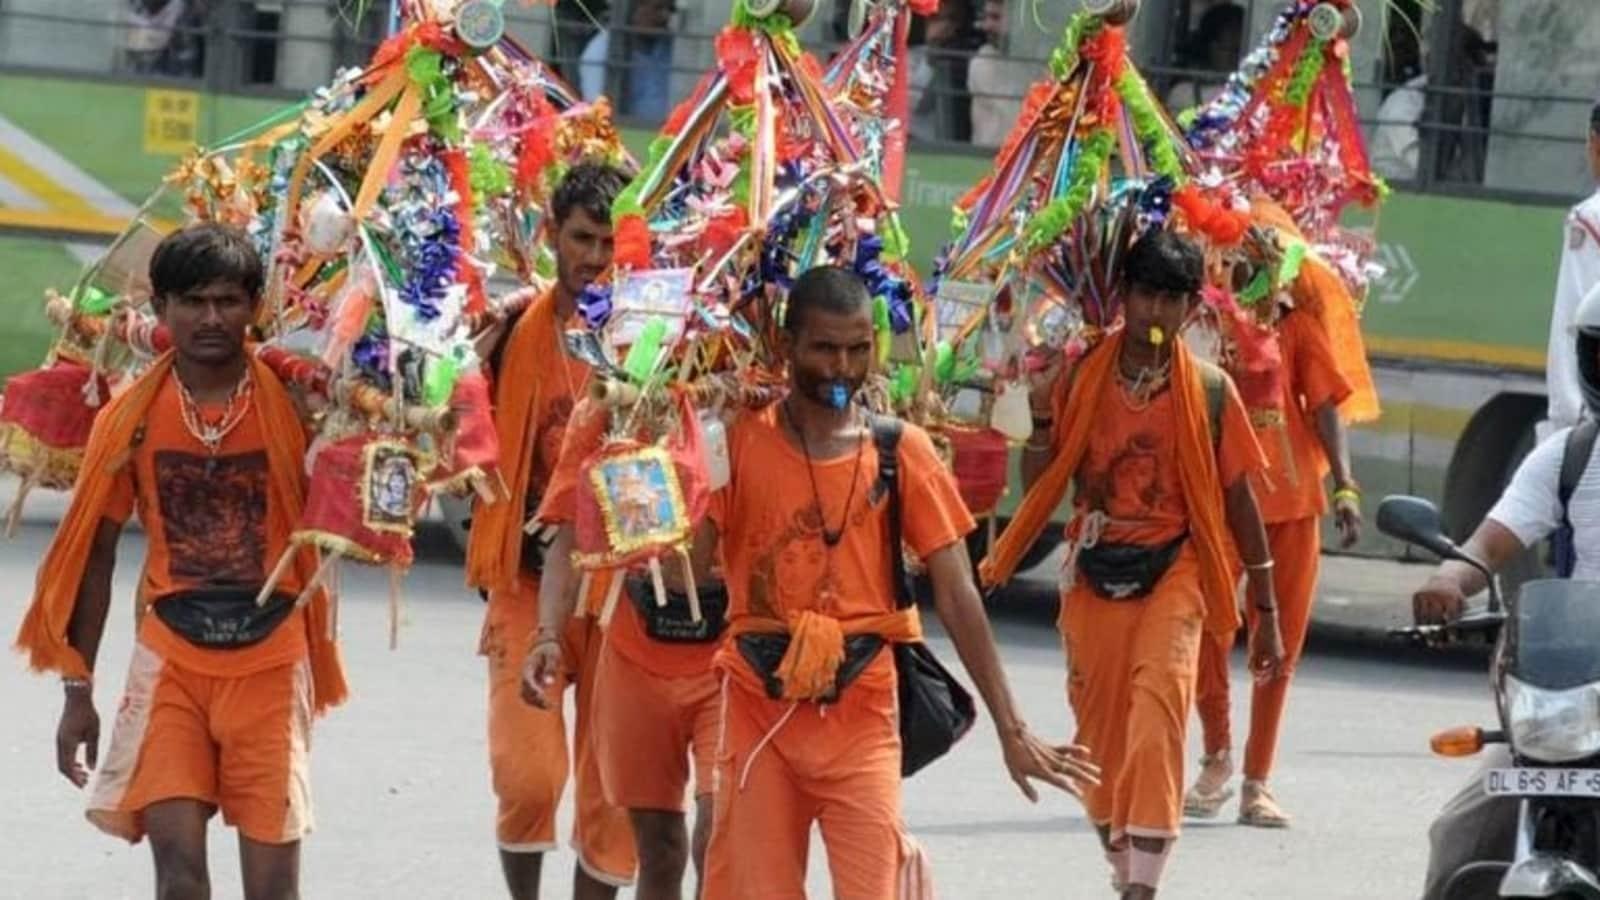 Uttarakhand govt cancels Kanwar yatra over coronavirus fears | Latest News India - Hindustan Times